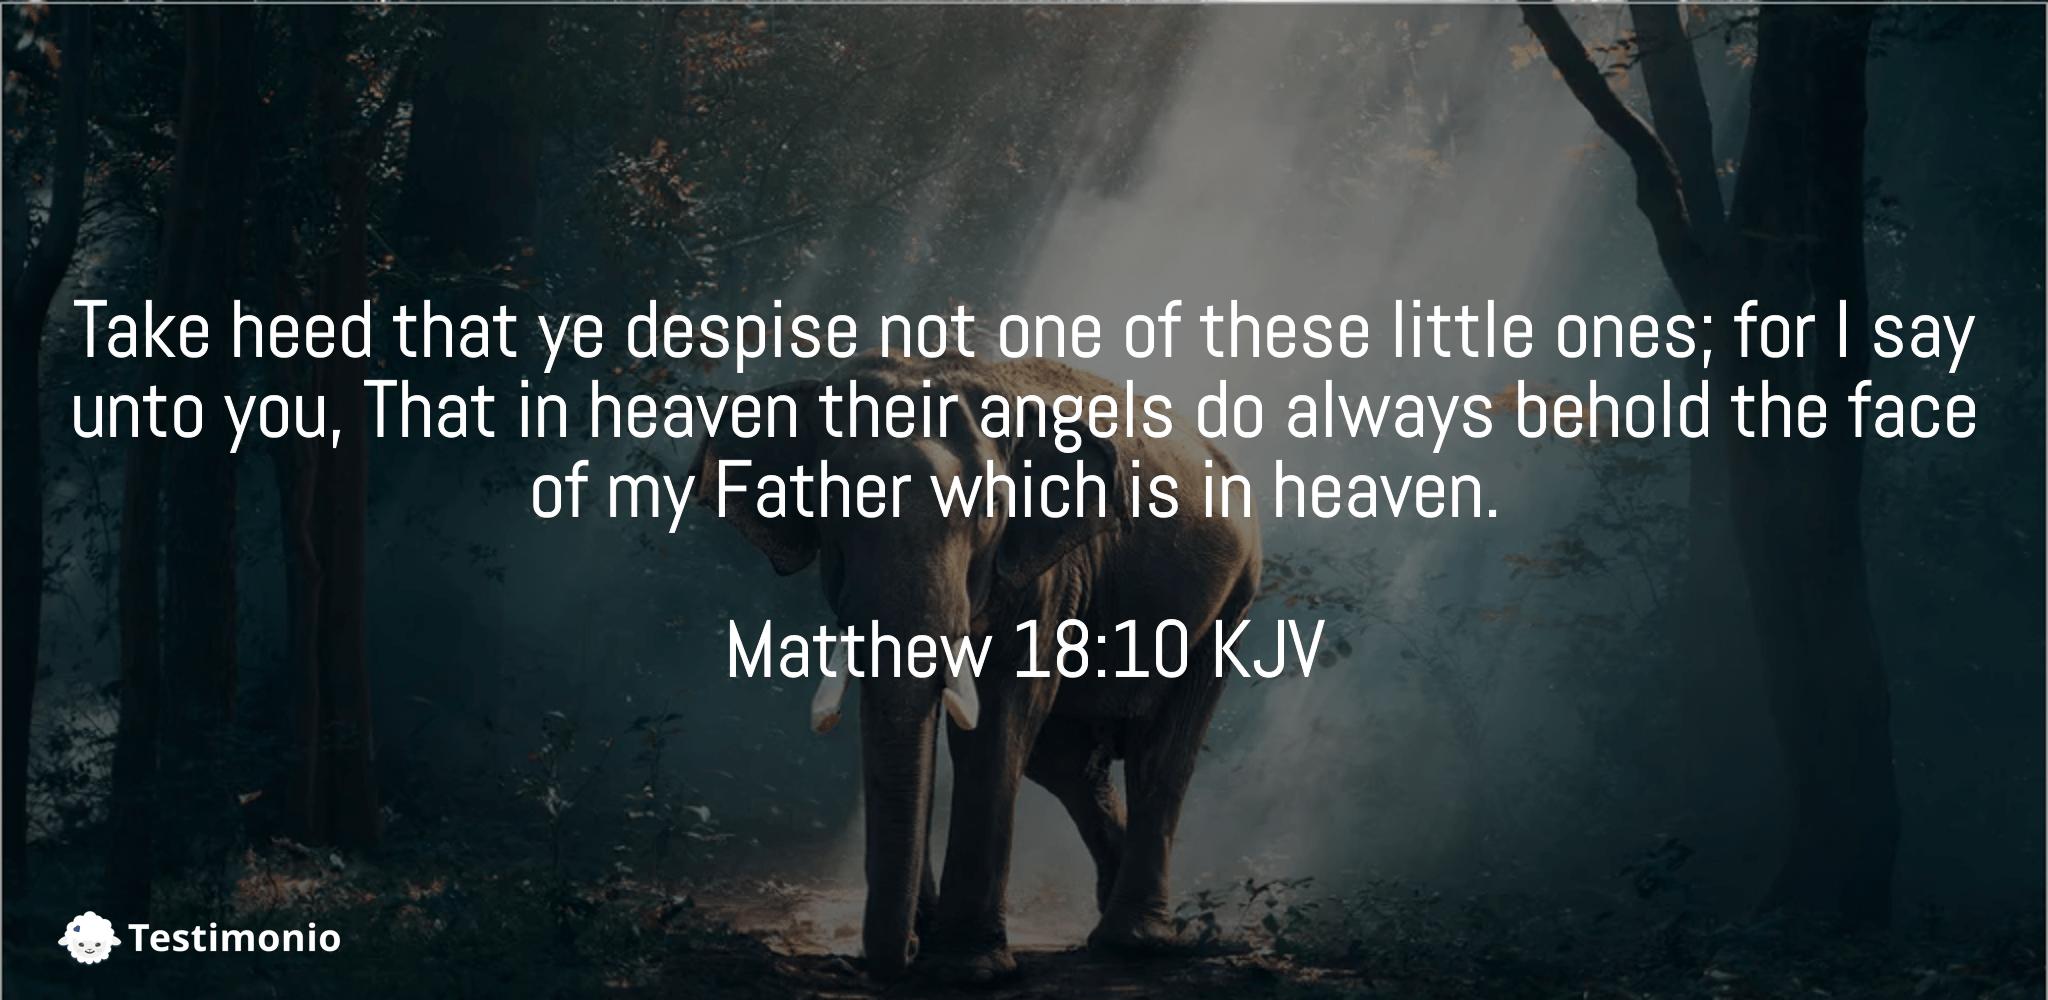 Matthew 18:10